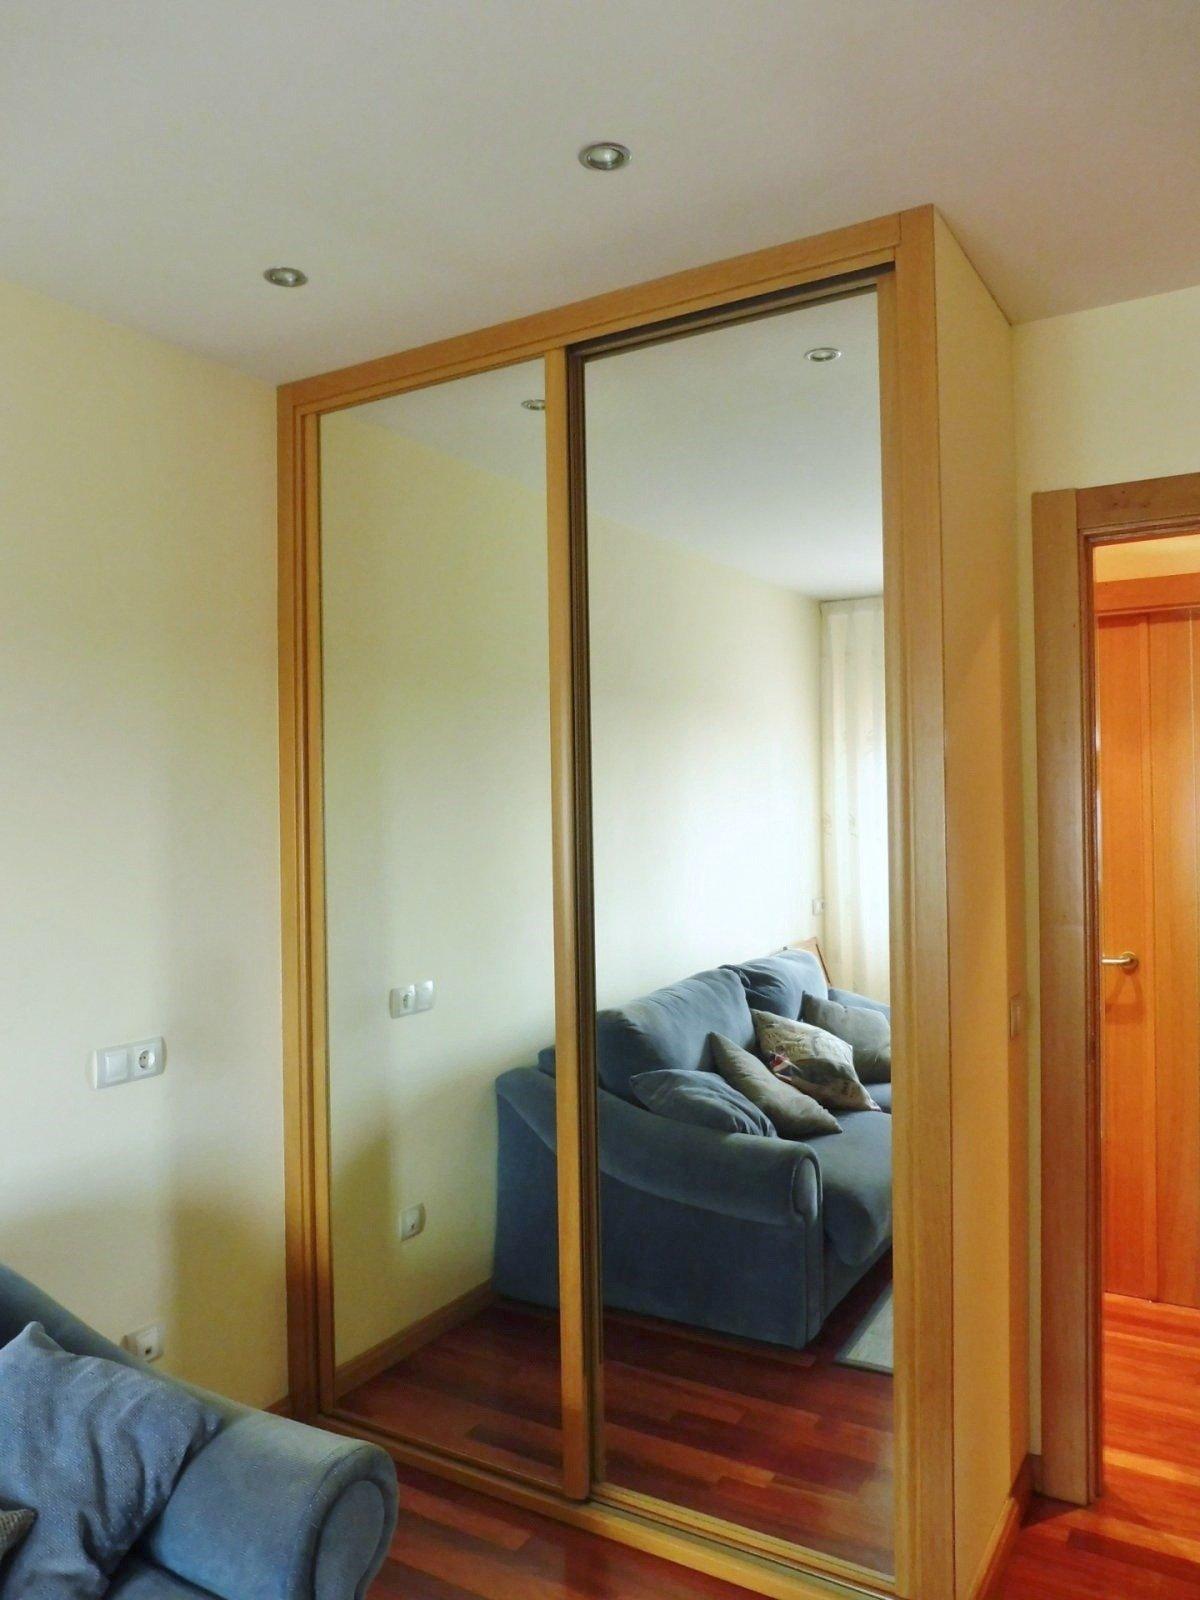 Bonito piso seminuevo - imagenInmueble14